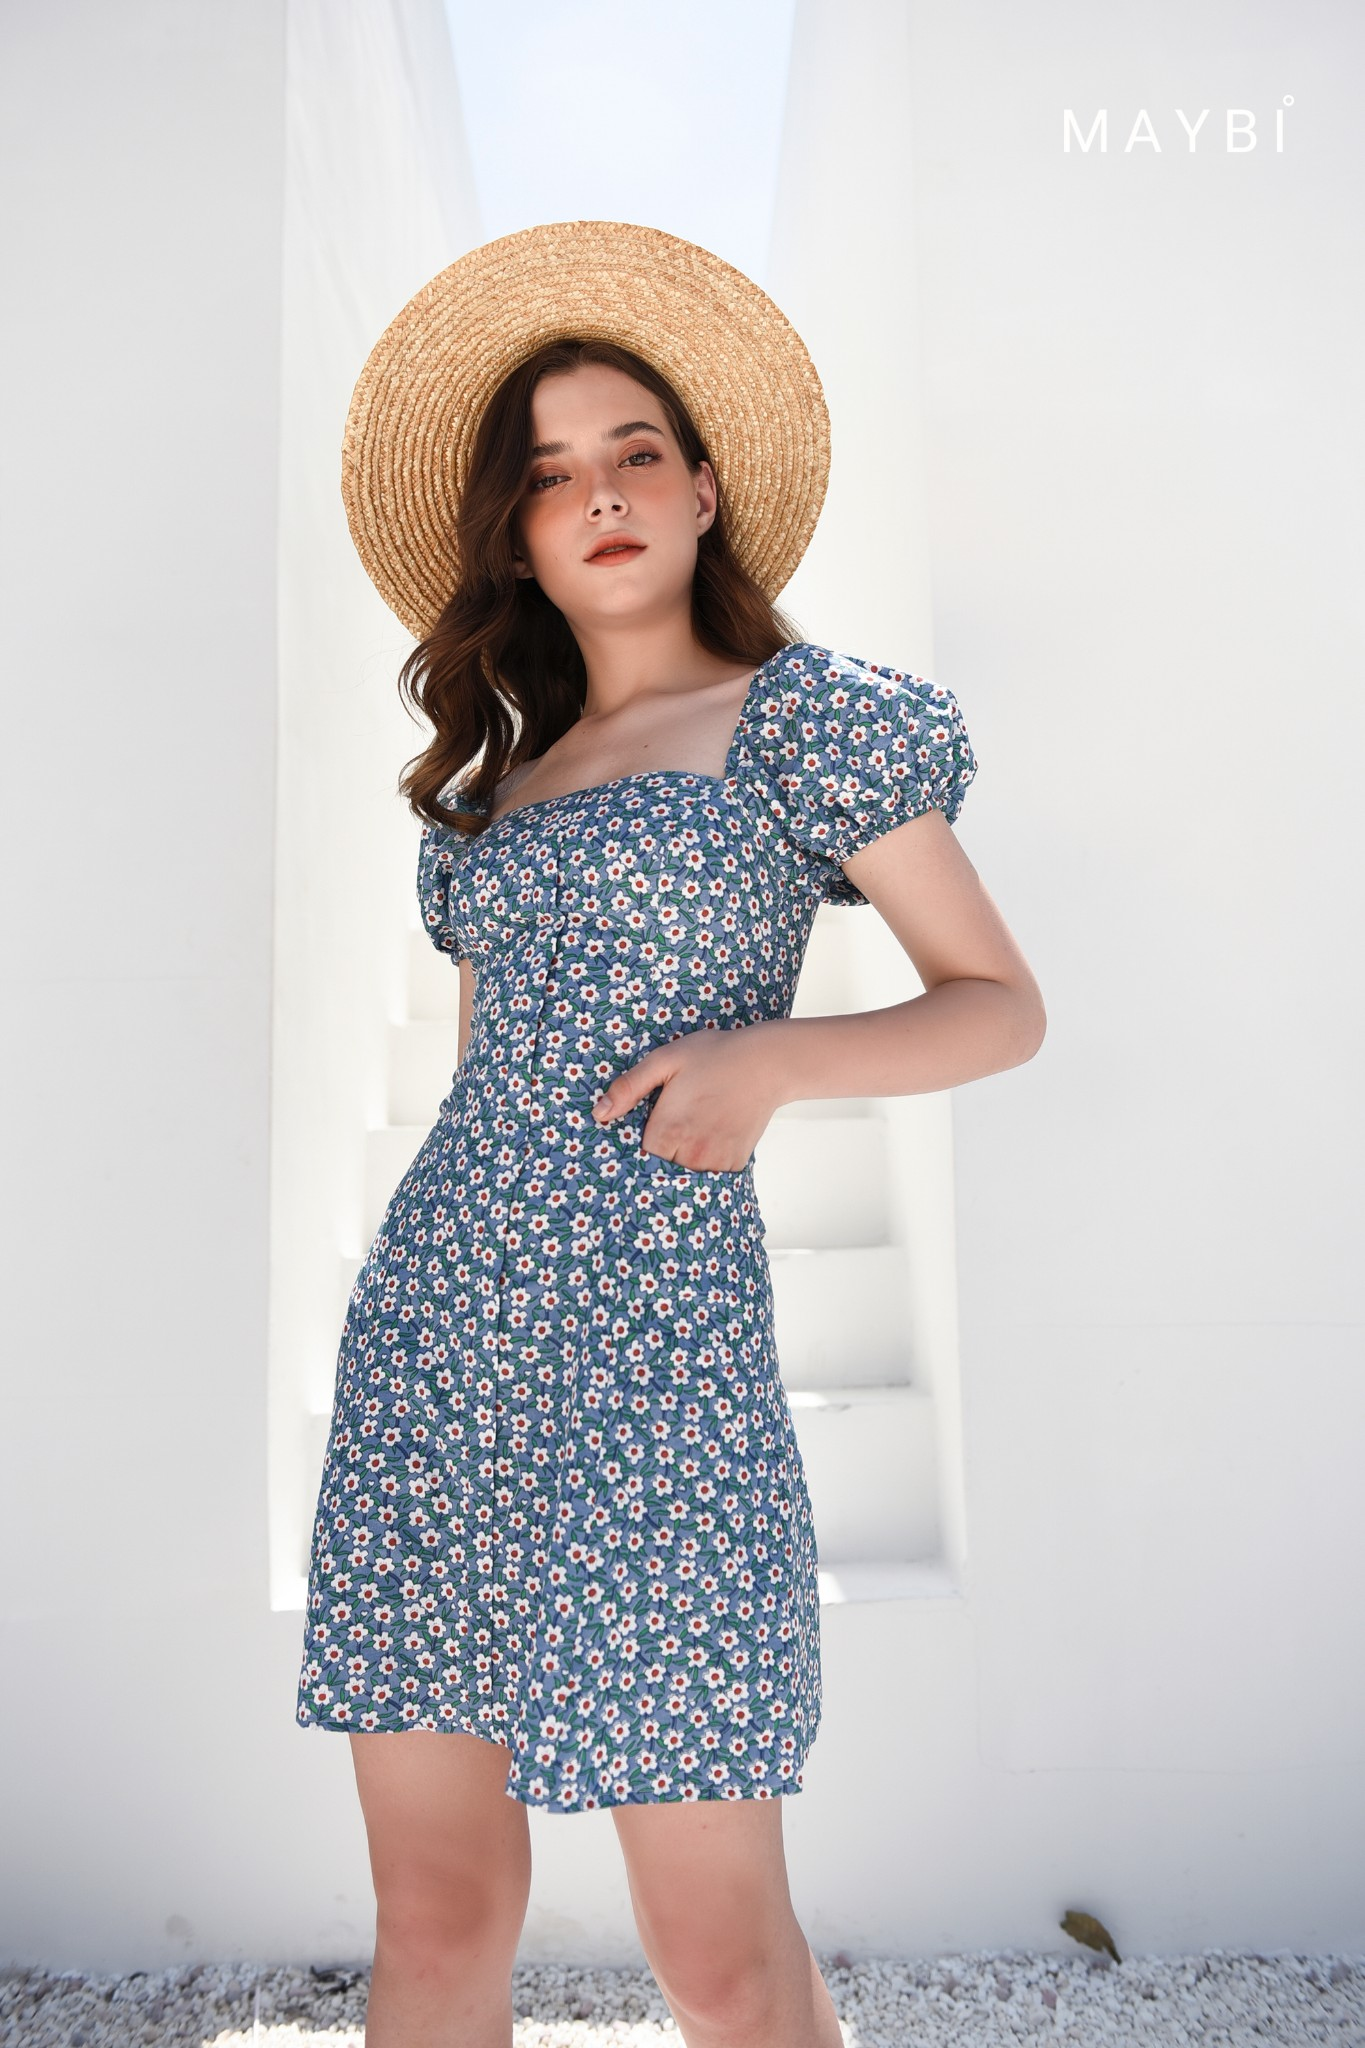 Đầm hoa nhí xanh - Tiny Blue Dress